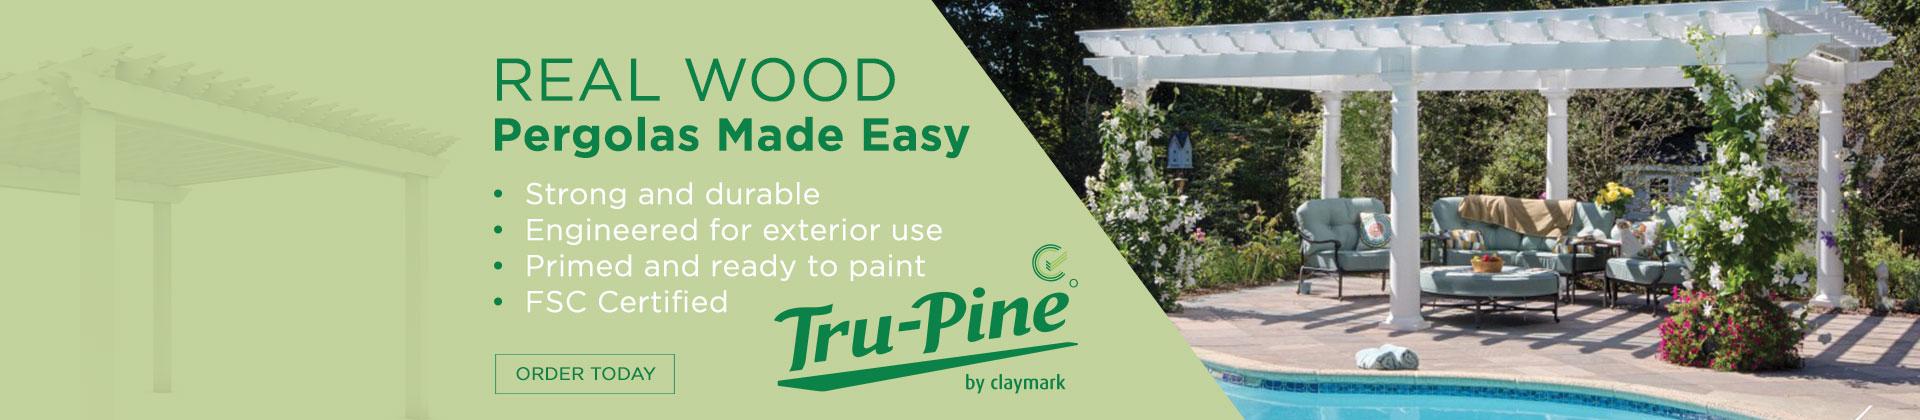 Warren Trask, Warren Trask Company, Premium Building Materials, Building Materials, Tru-Pine, Claymark, pergolas, banner